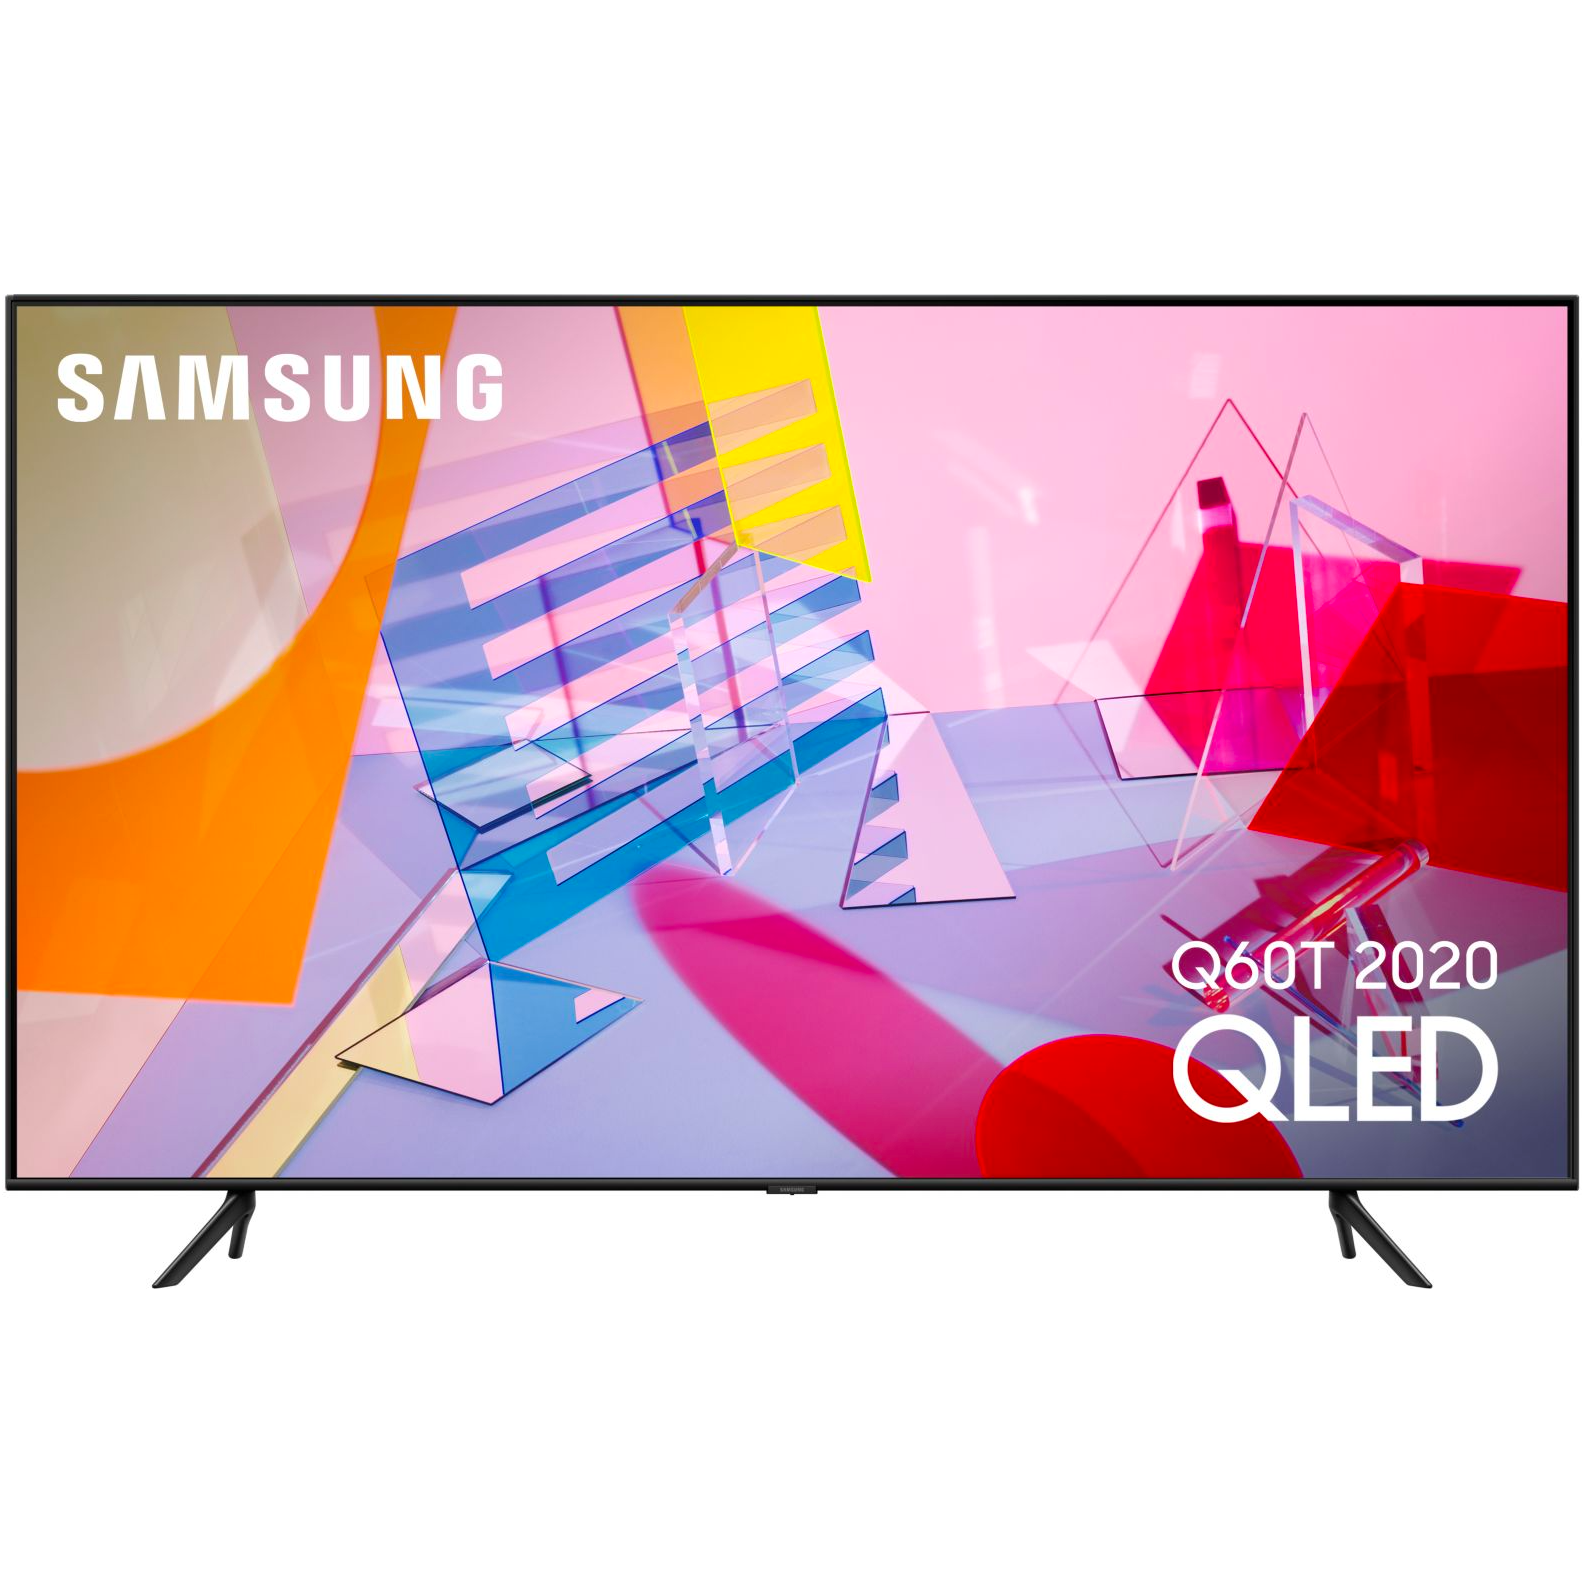 TV SAMSUNG QLED QE55Q60T- image 1